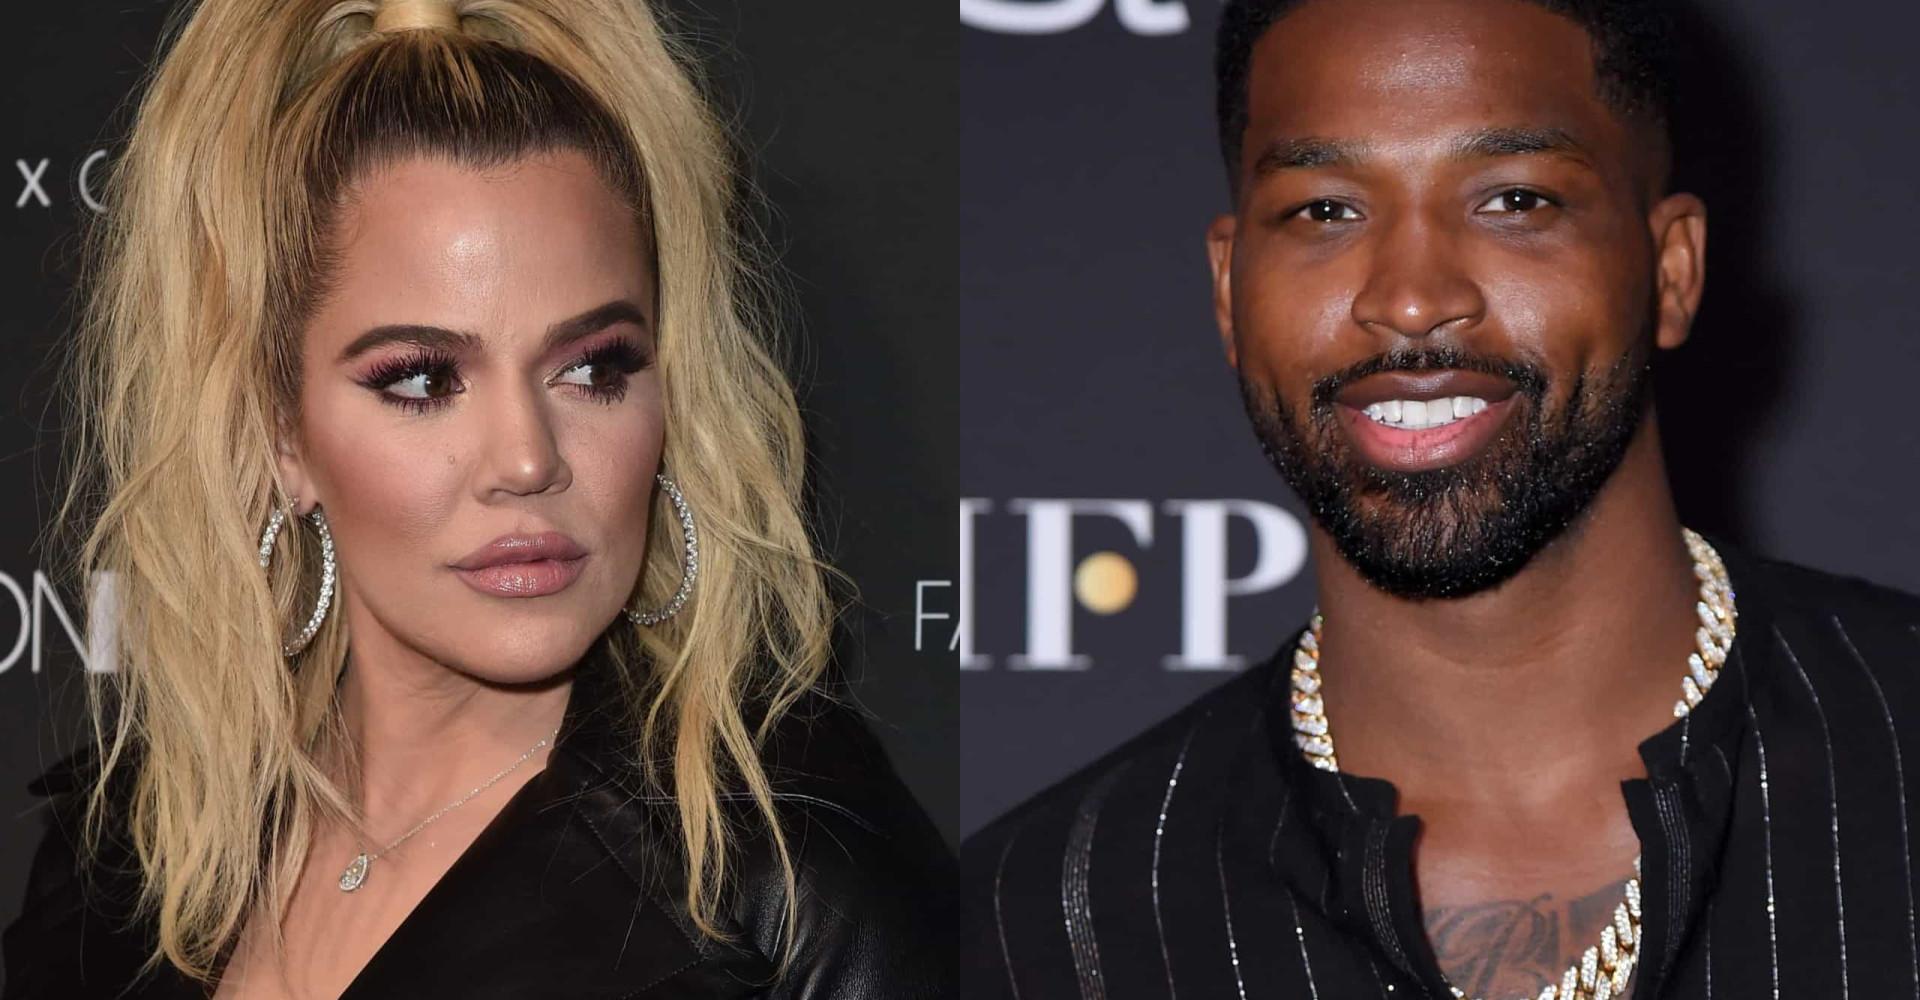 Khloé Kardashian and Tristan Thompson are back together